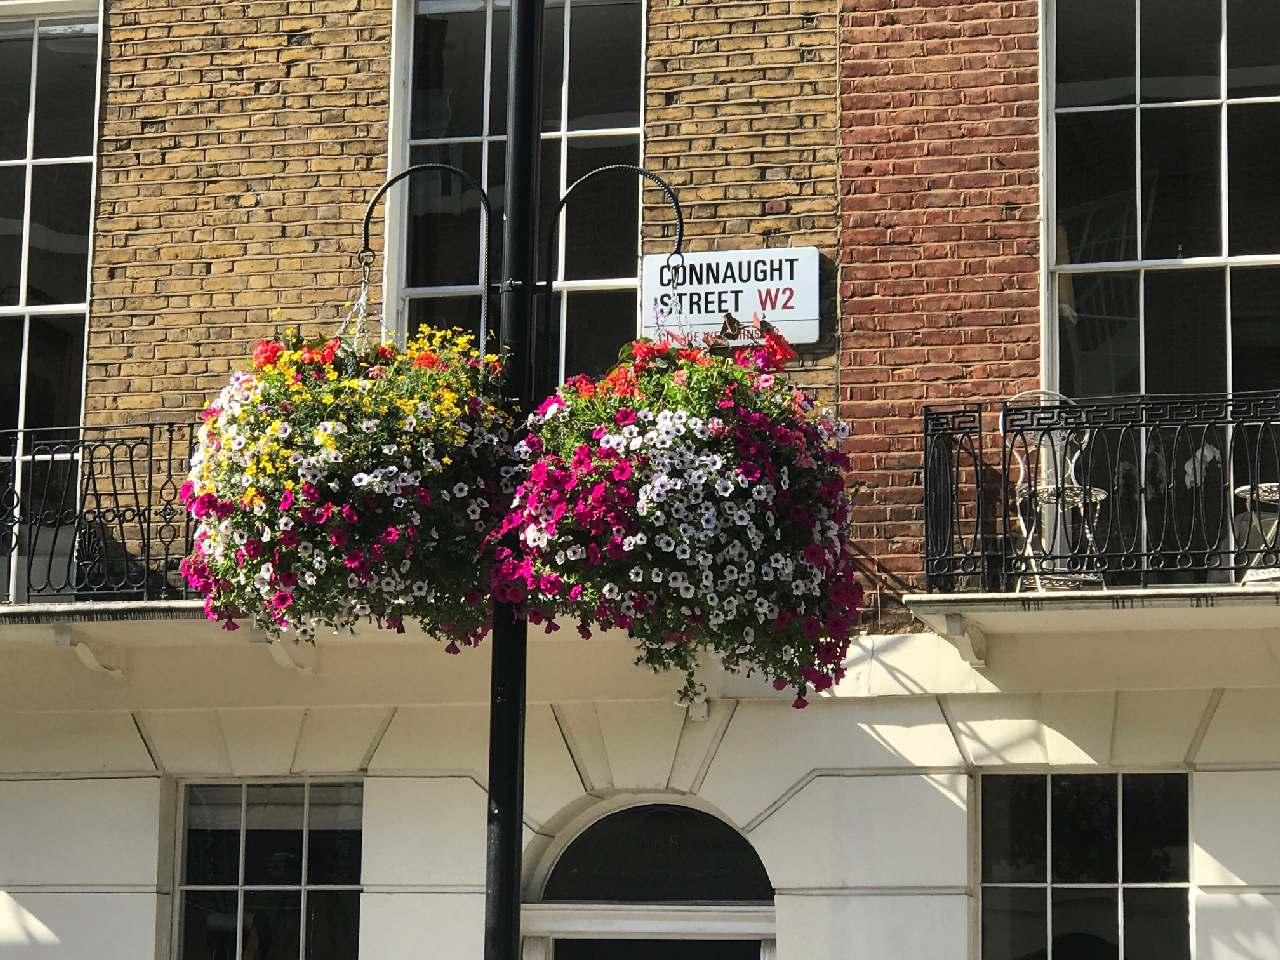 Connaught Street